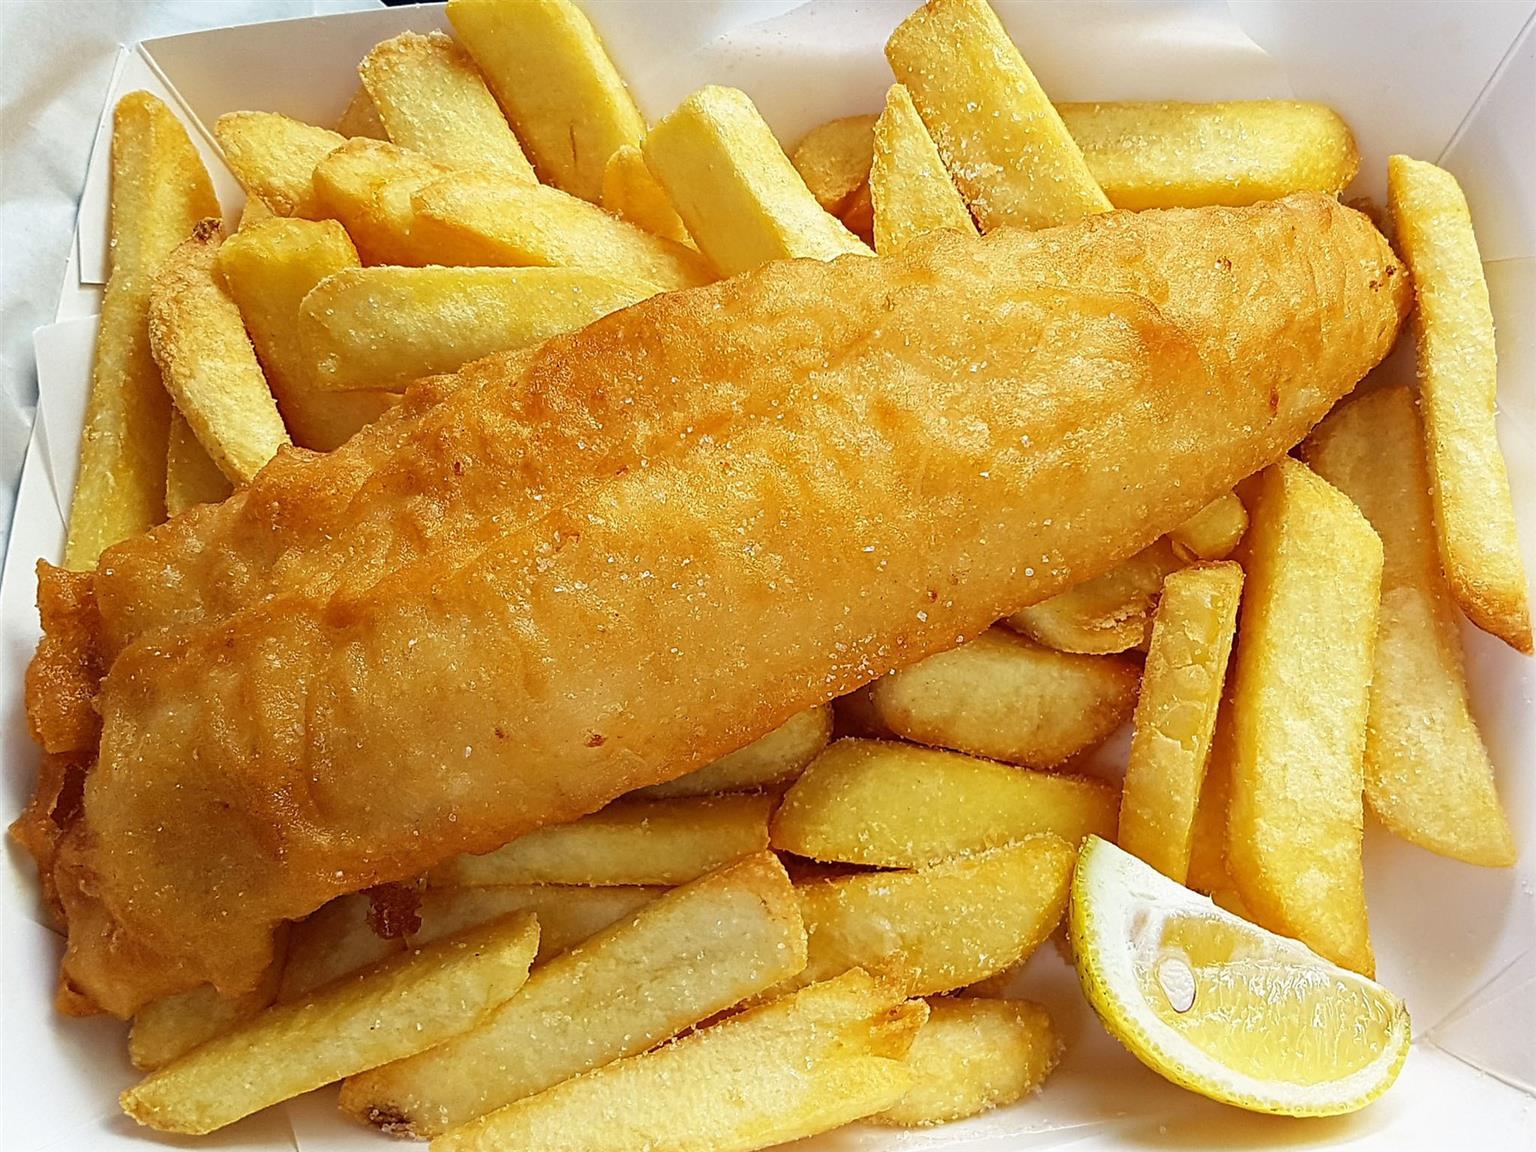 Fish & Chips Shop (Germiston)